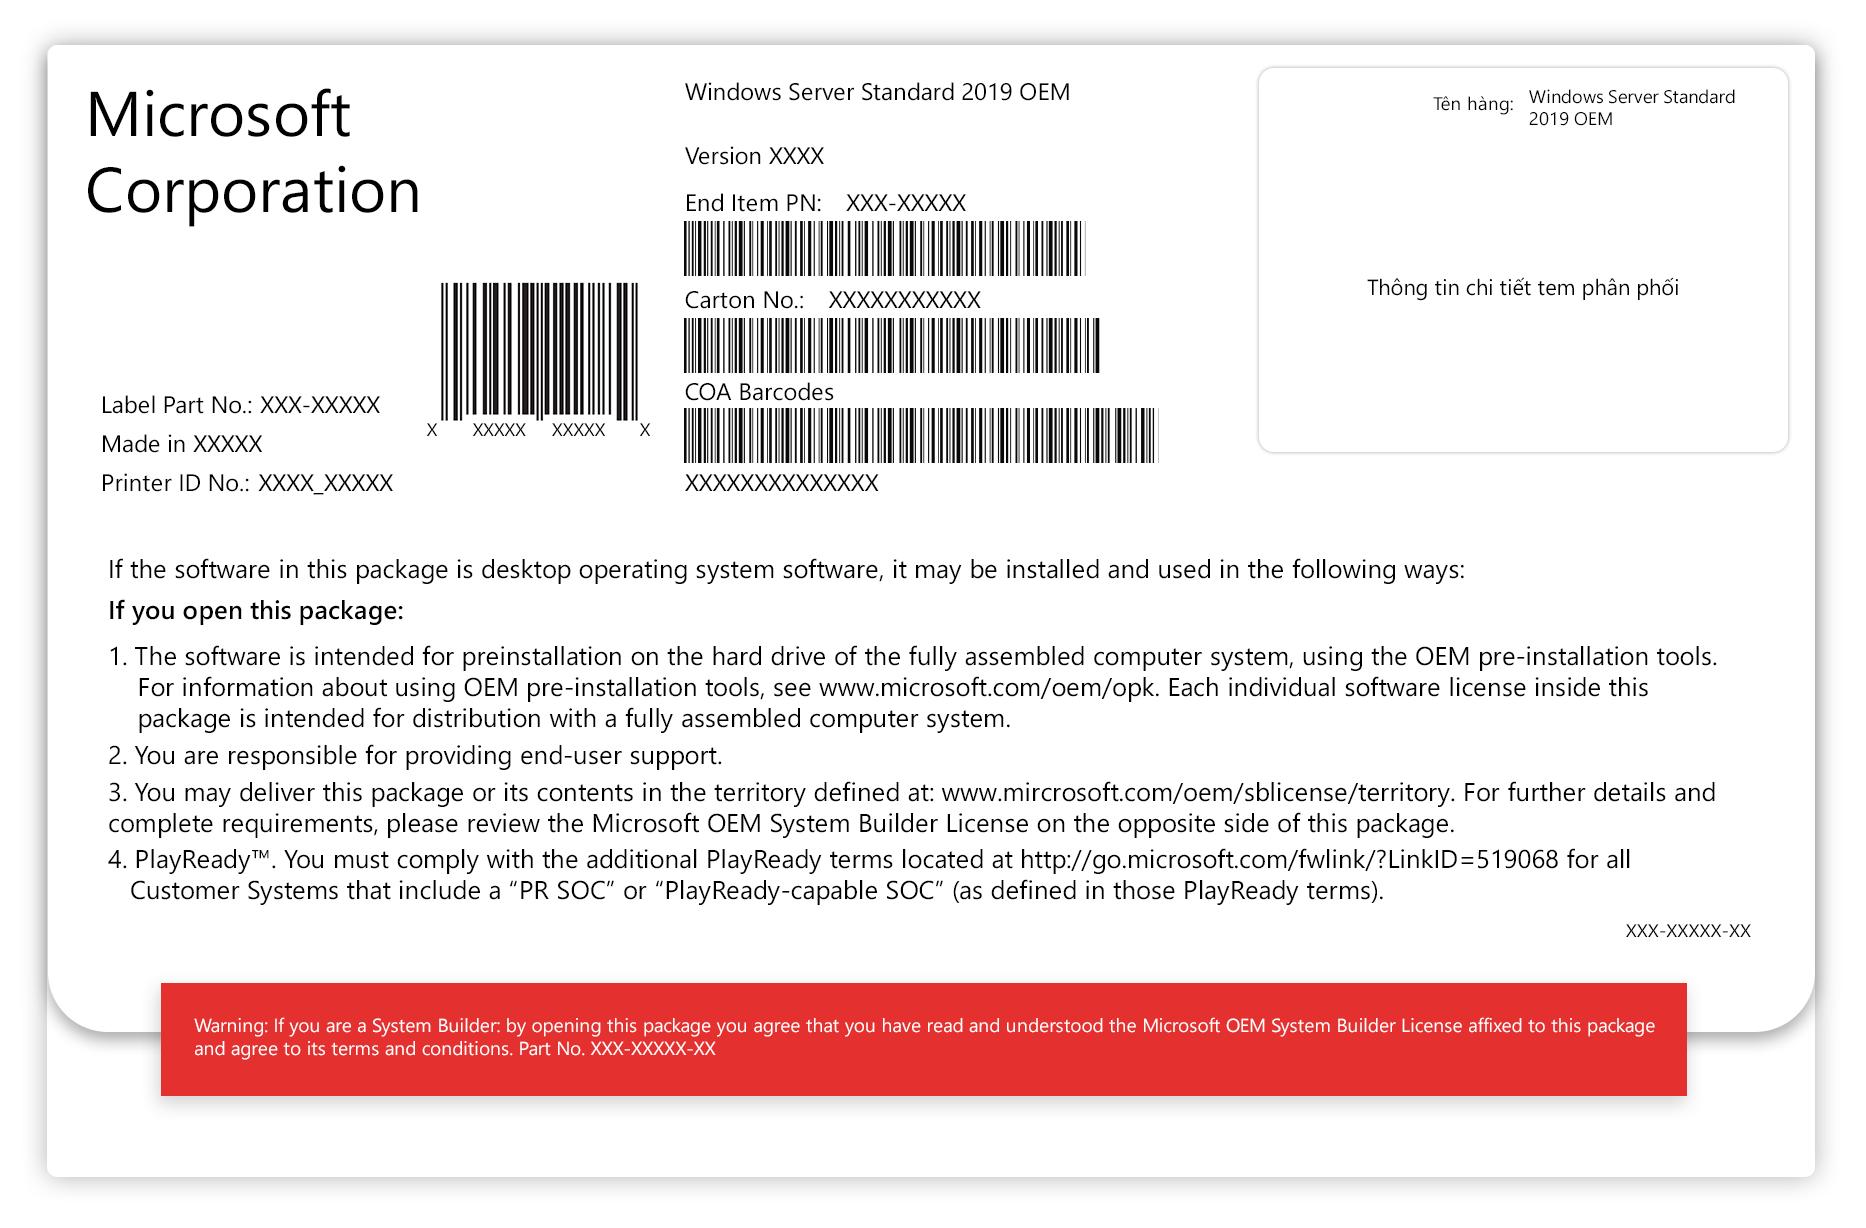 Phần mềm Windows Svr Std 2019 64Bit English 1pk DSP OEI DVD 16 Core  P73-07788